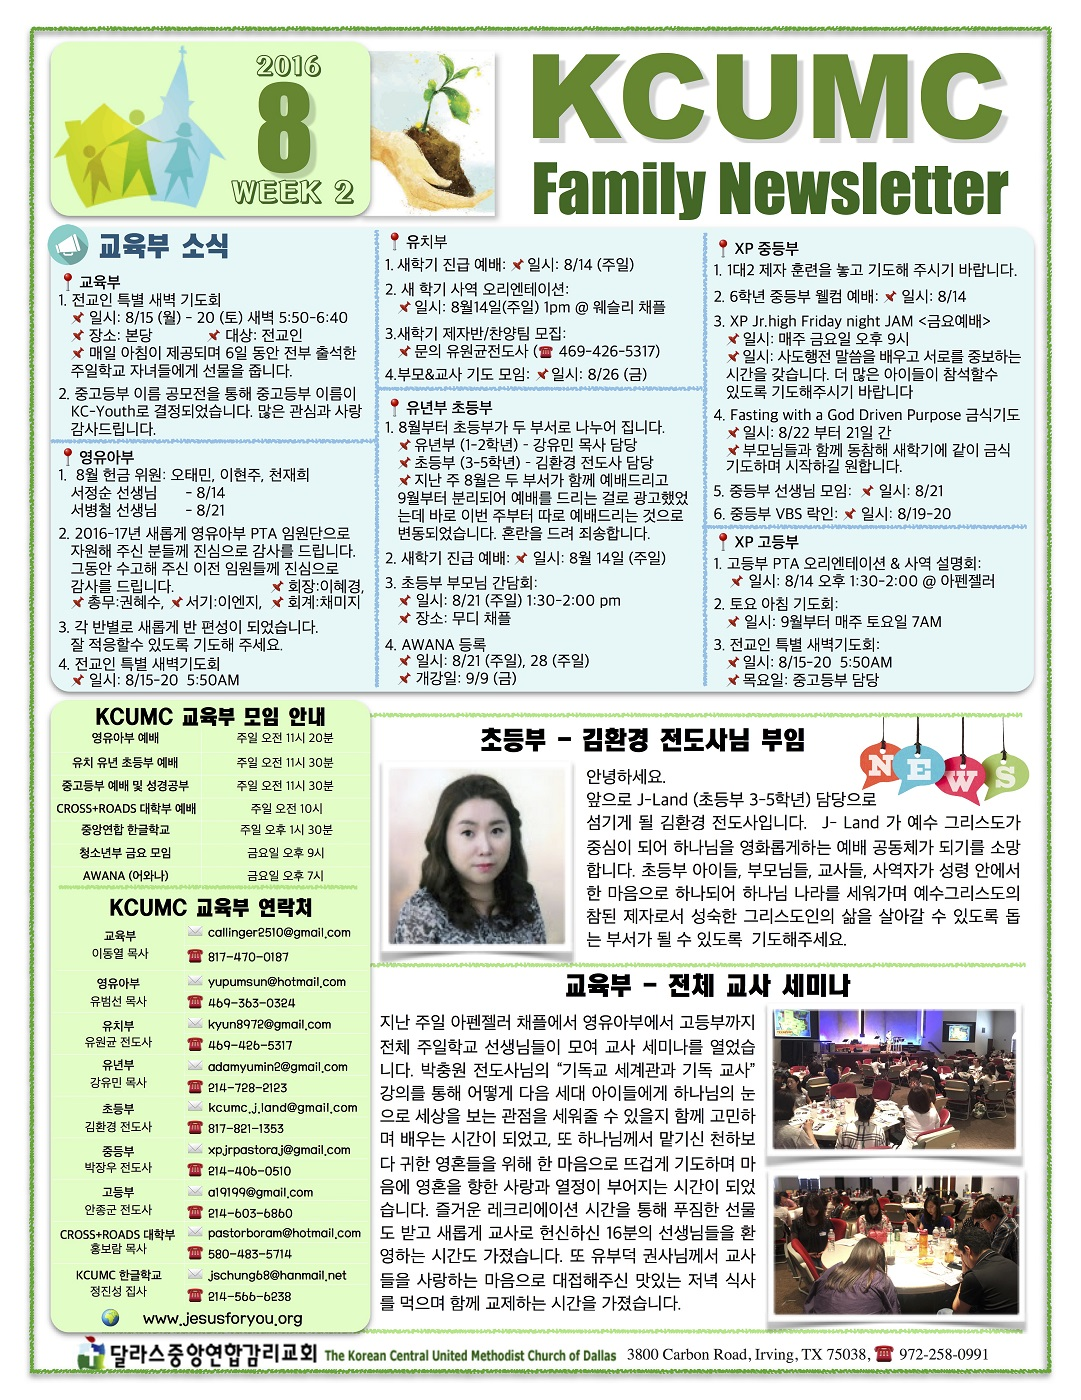 Newsletter 8월 2주 1